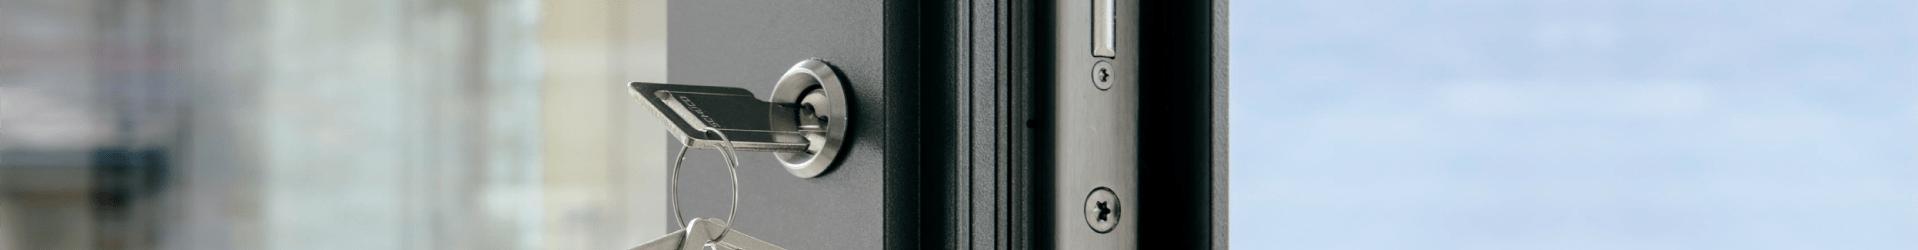 Sicurezza: controllo apertura varchi tramite Sonoff RF Bridge e Apple HomeKit (via Homebridge)